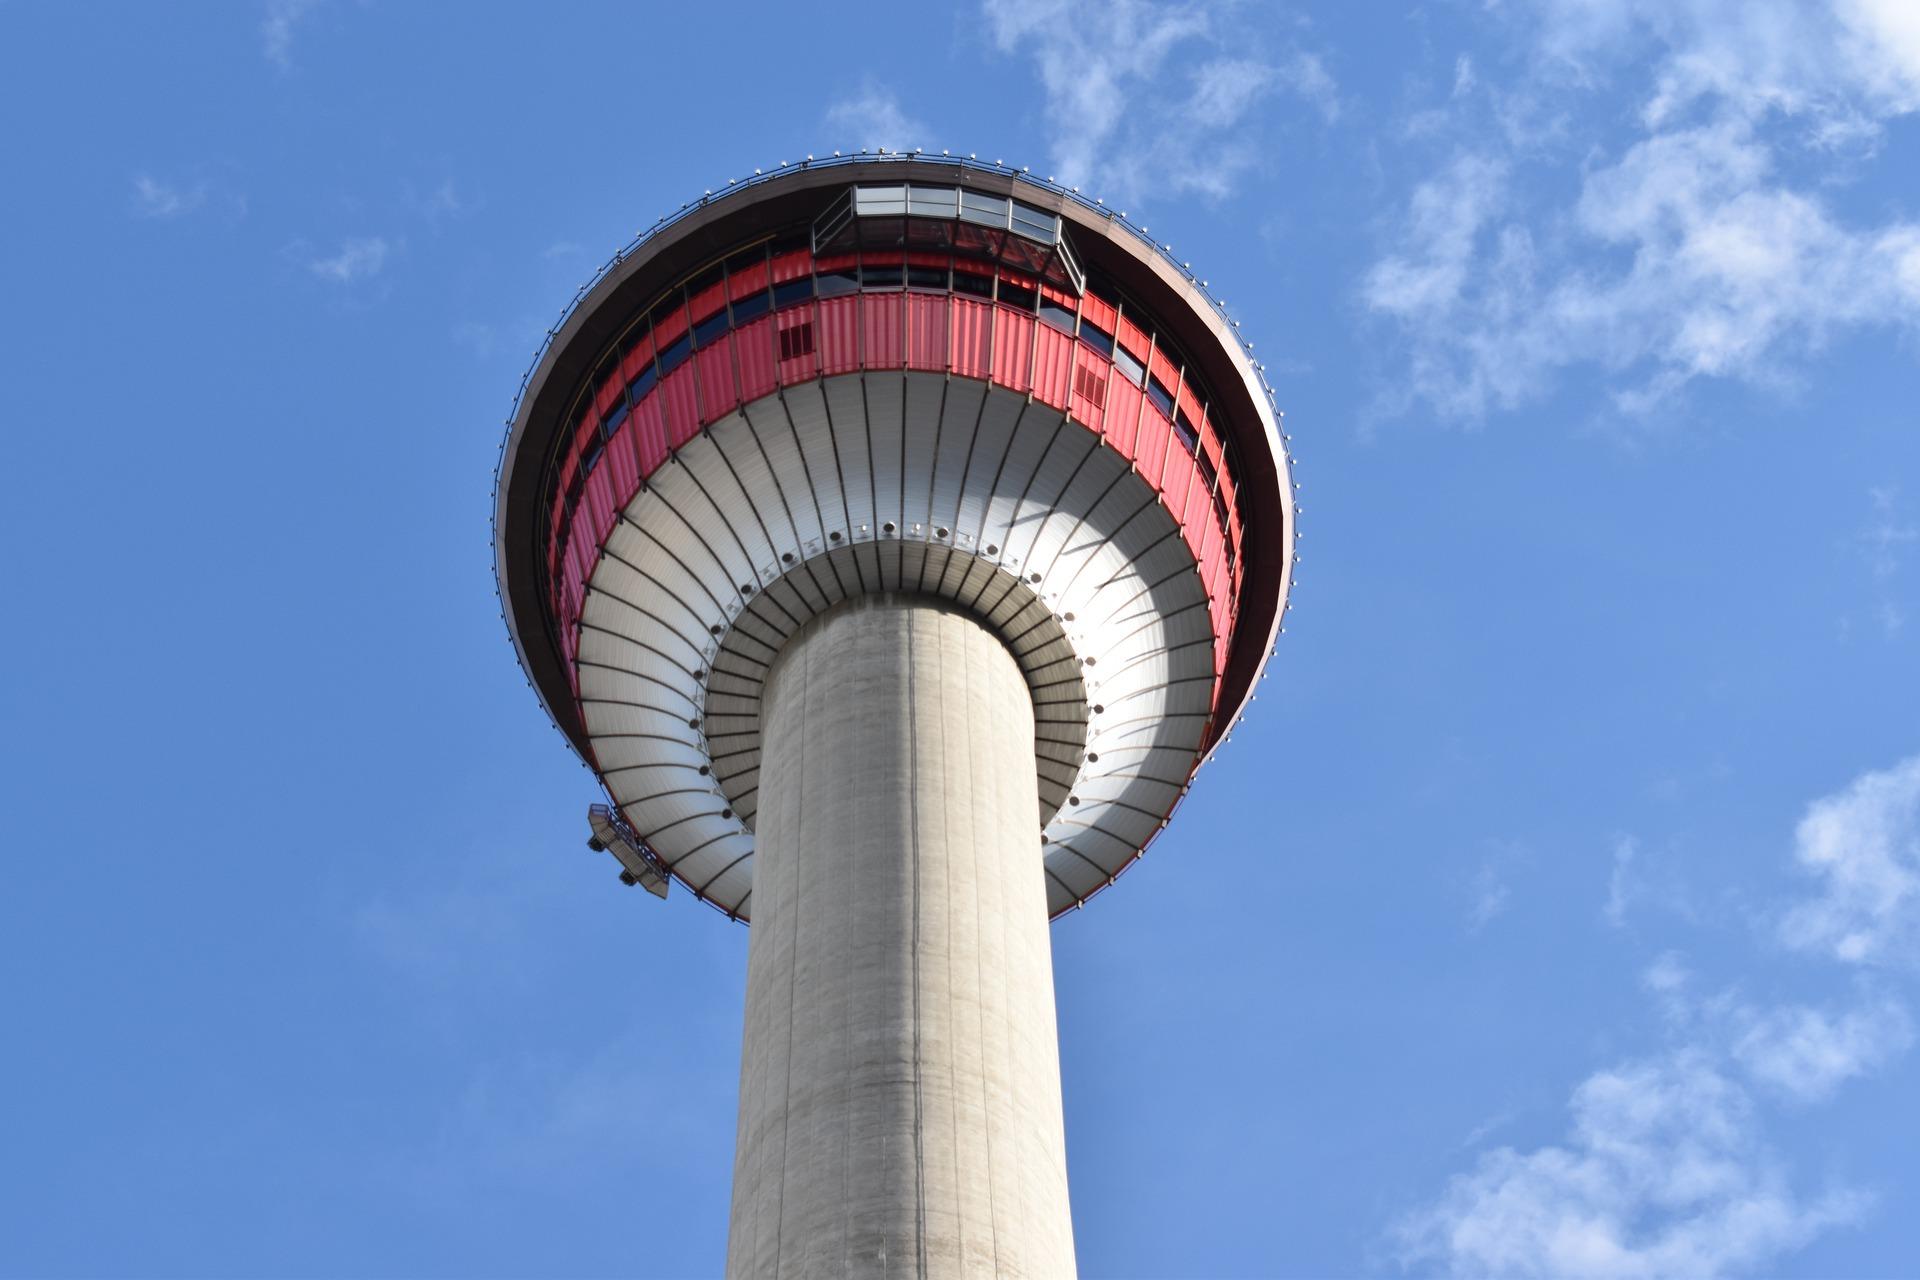 calgary-tower-4266002_1920.jpg